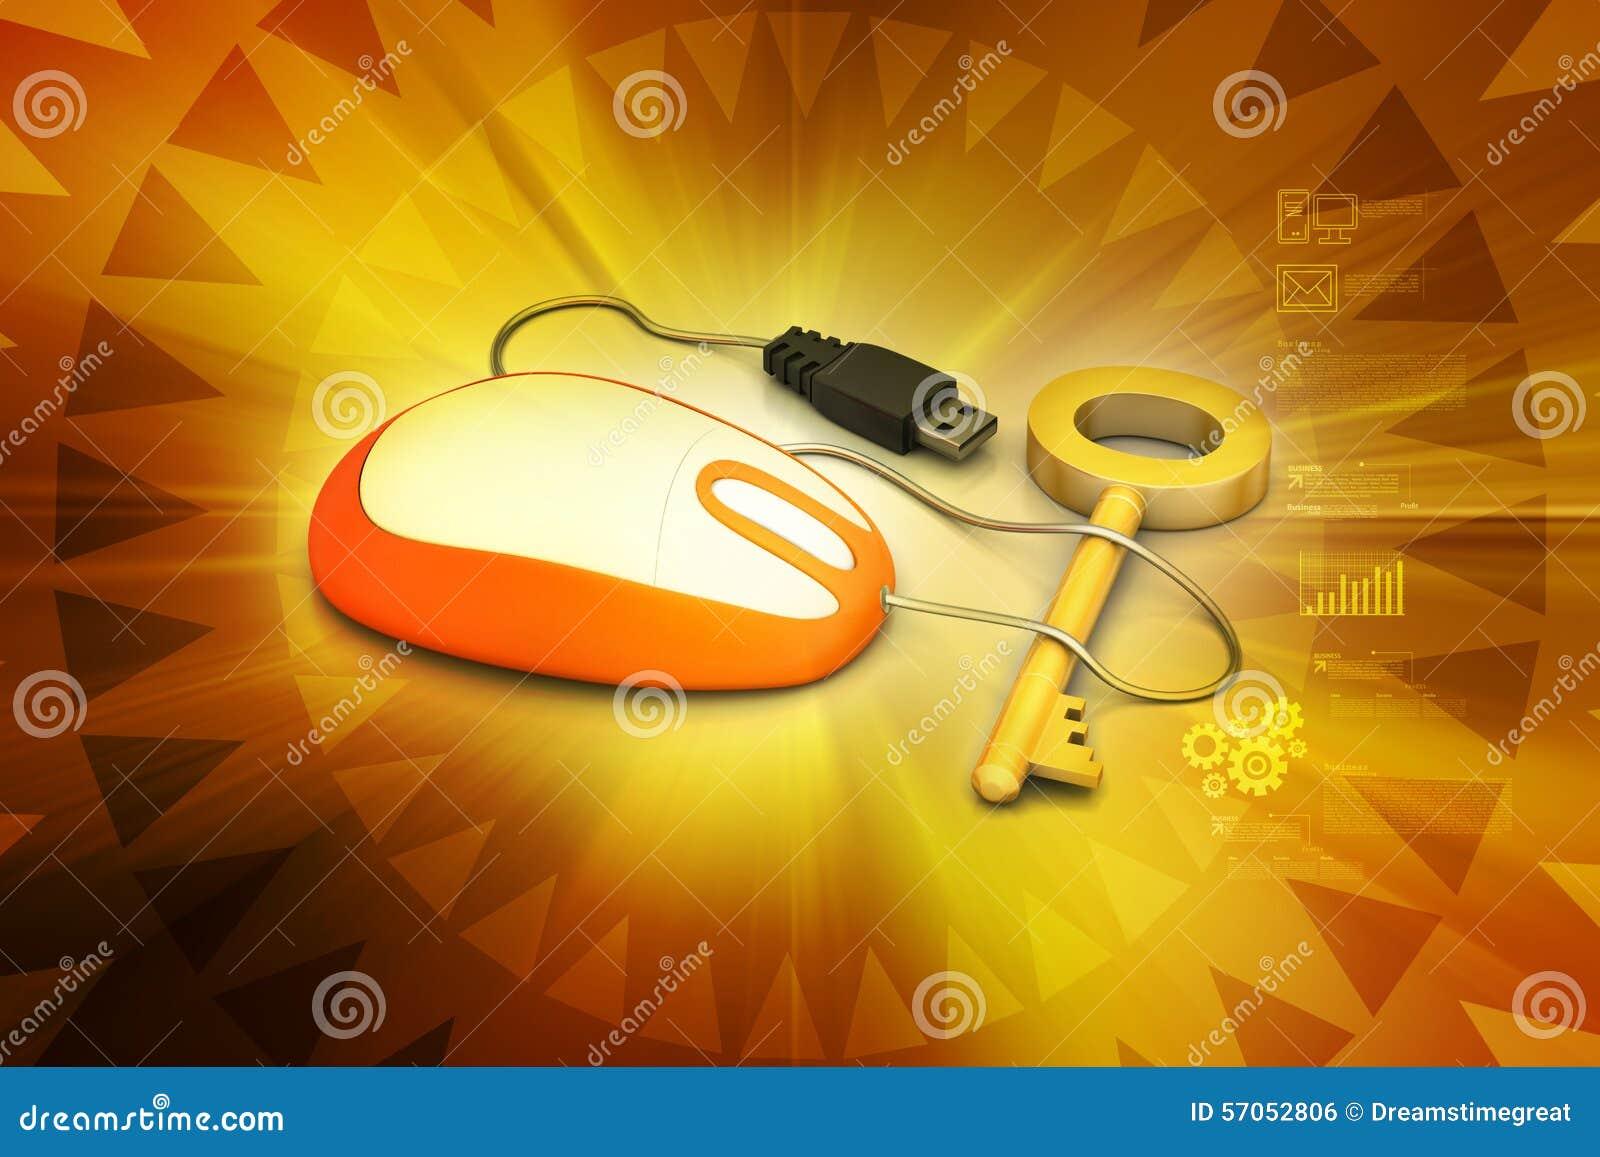 Muis aan sleutel wordt aangesloten die